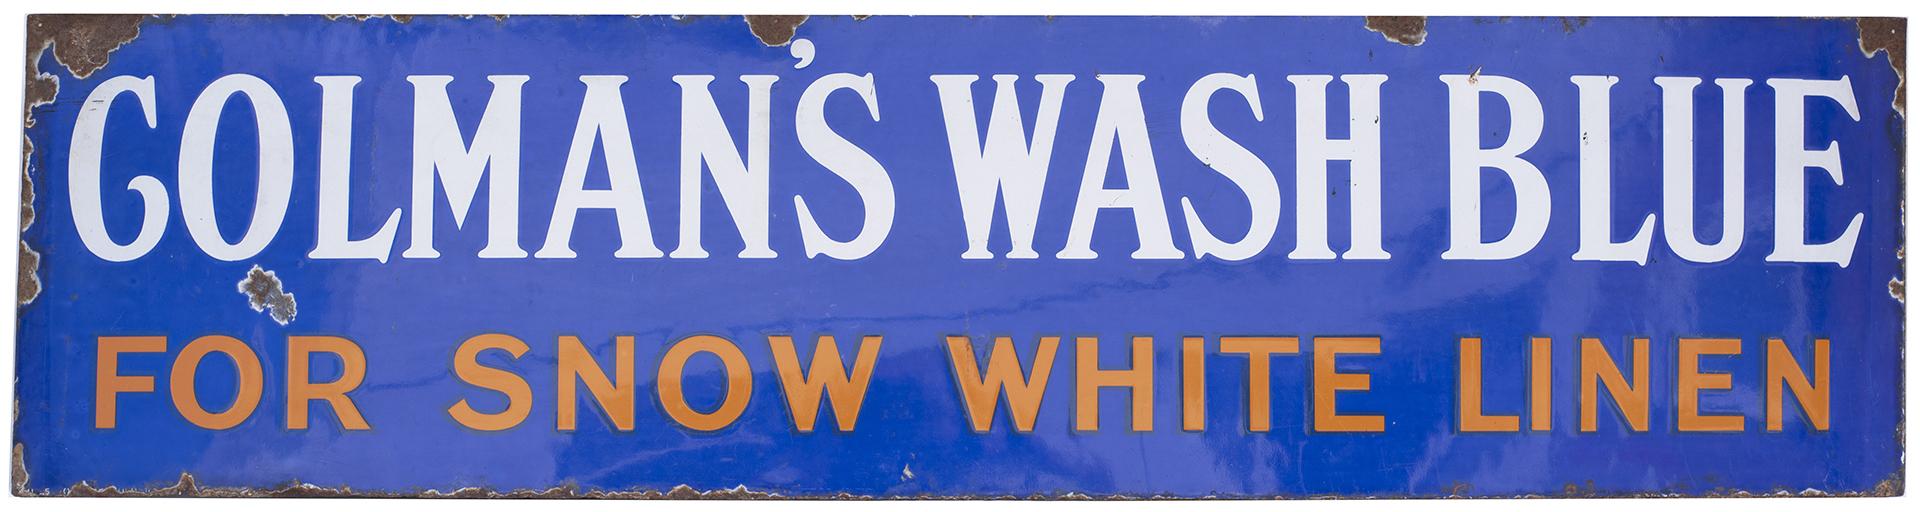 Advertising Enamel Sign COLMAN'S WASH BLUE FOR